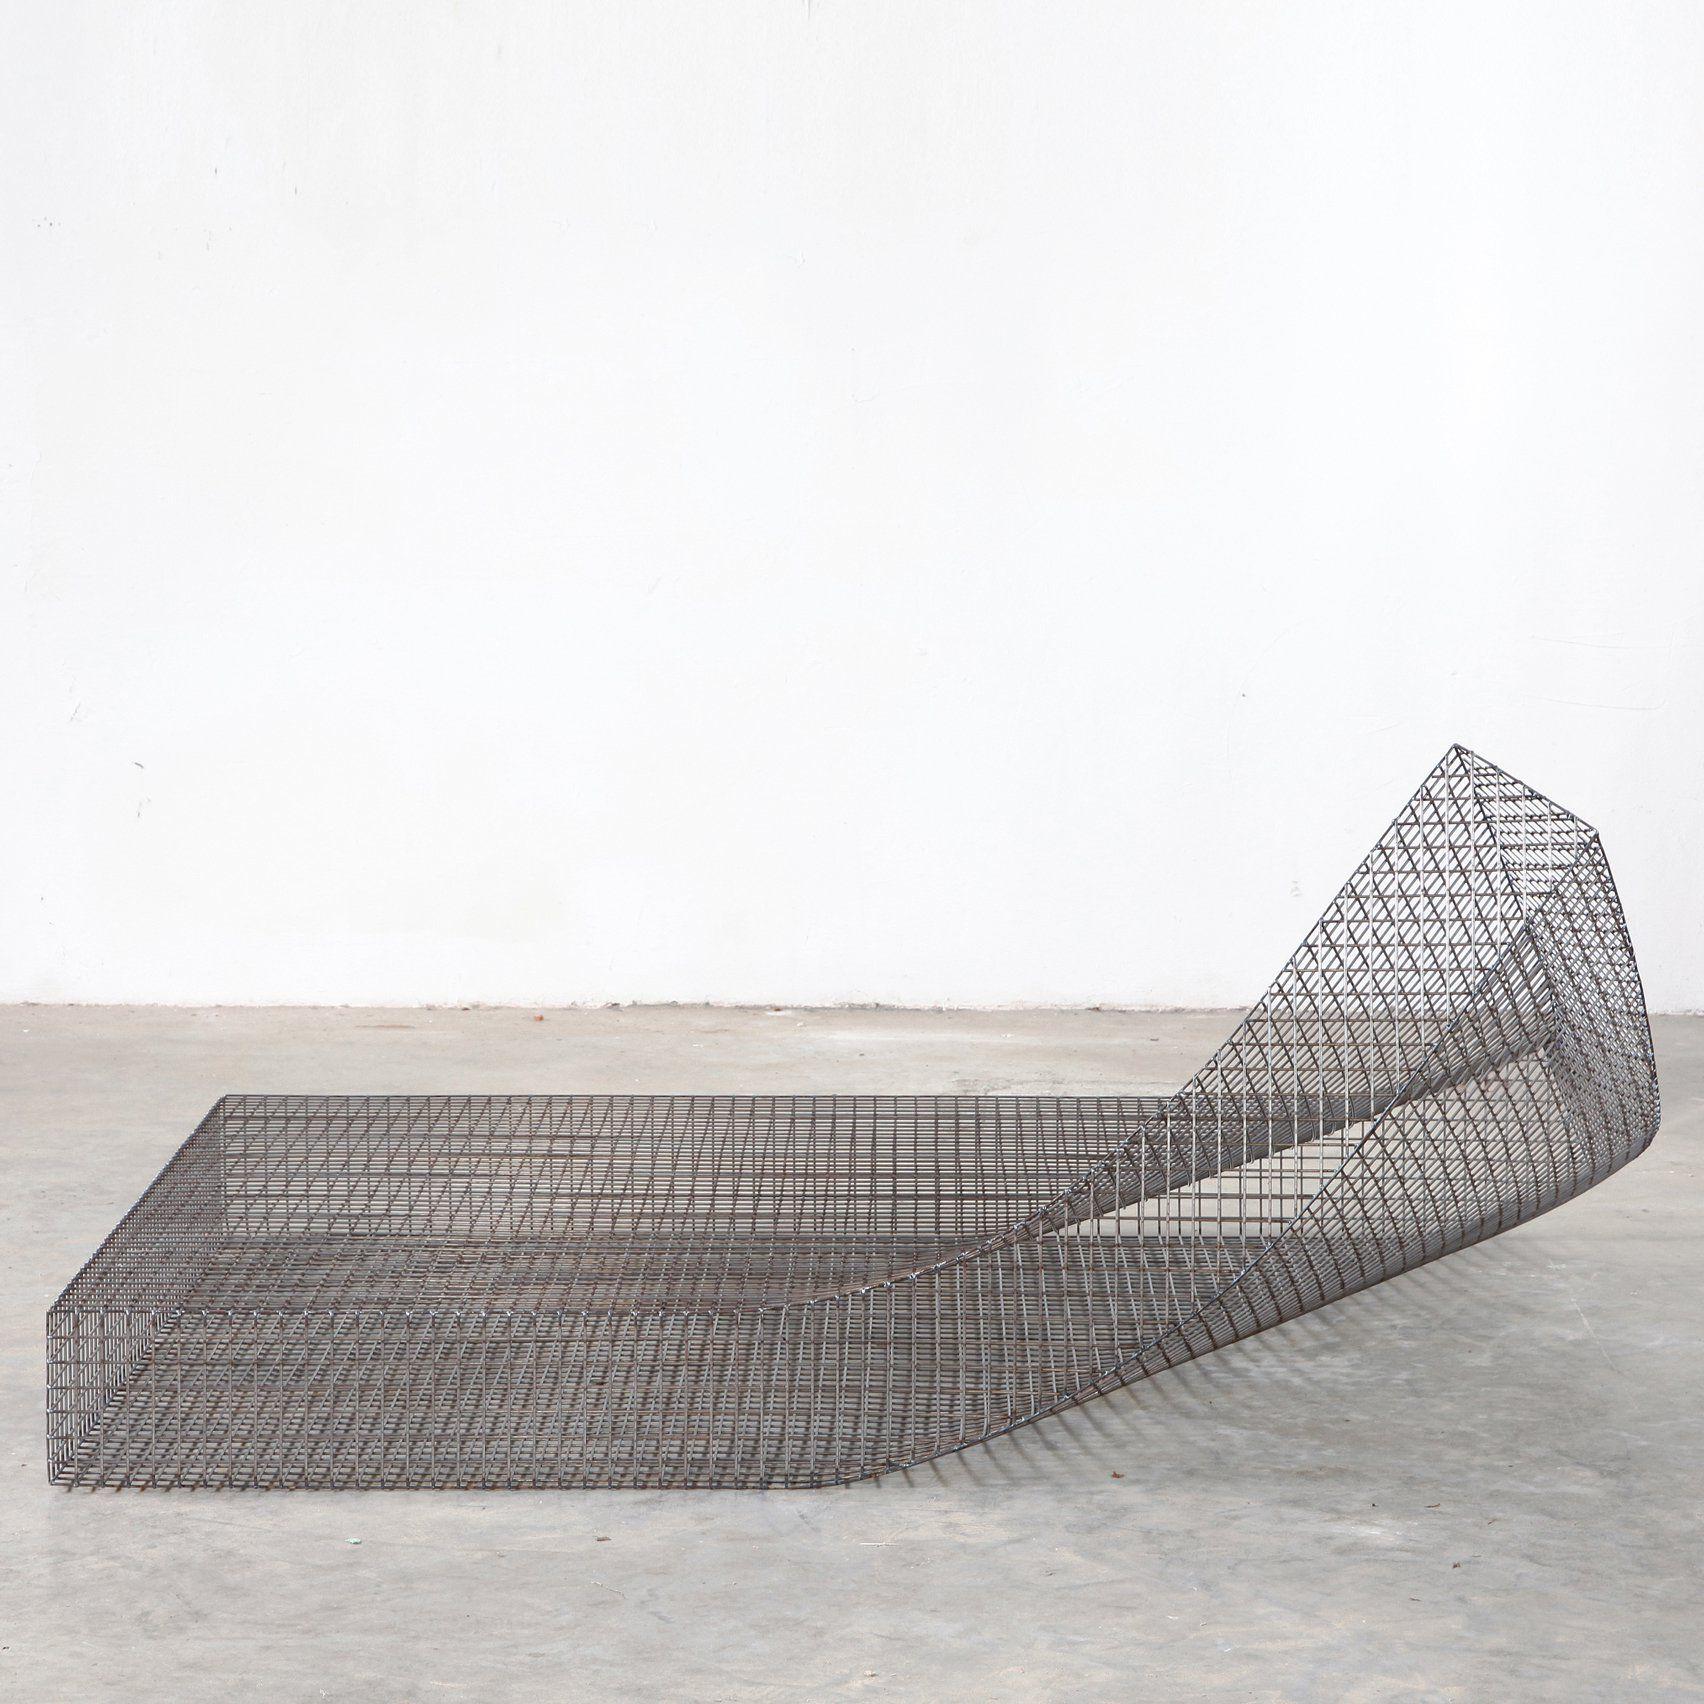 Wire by Muller van Severen is one of James Mair's top five ...